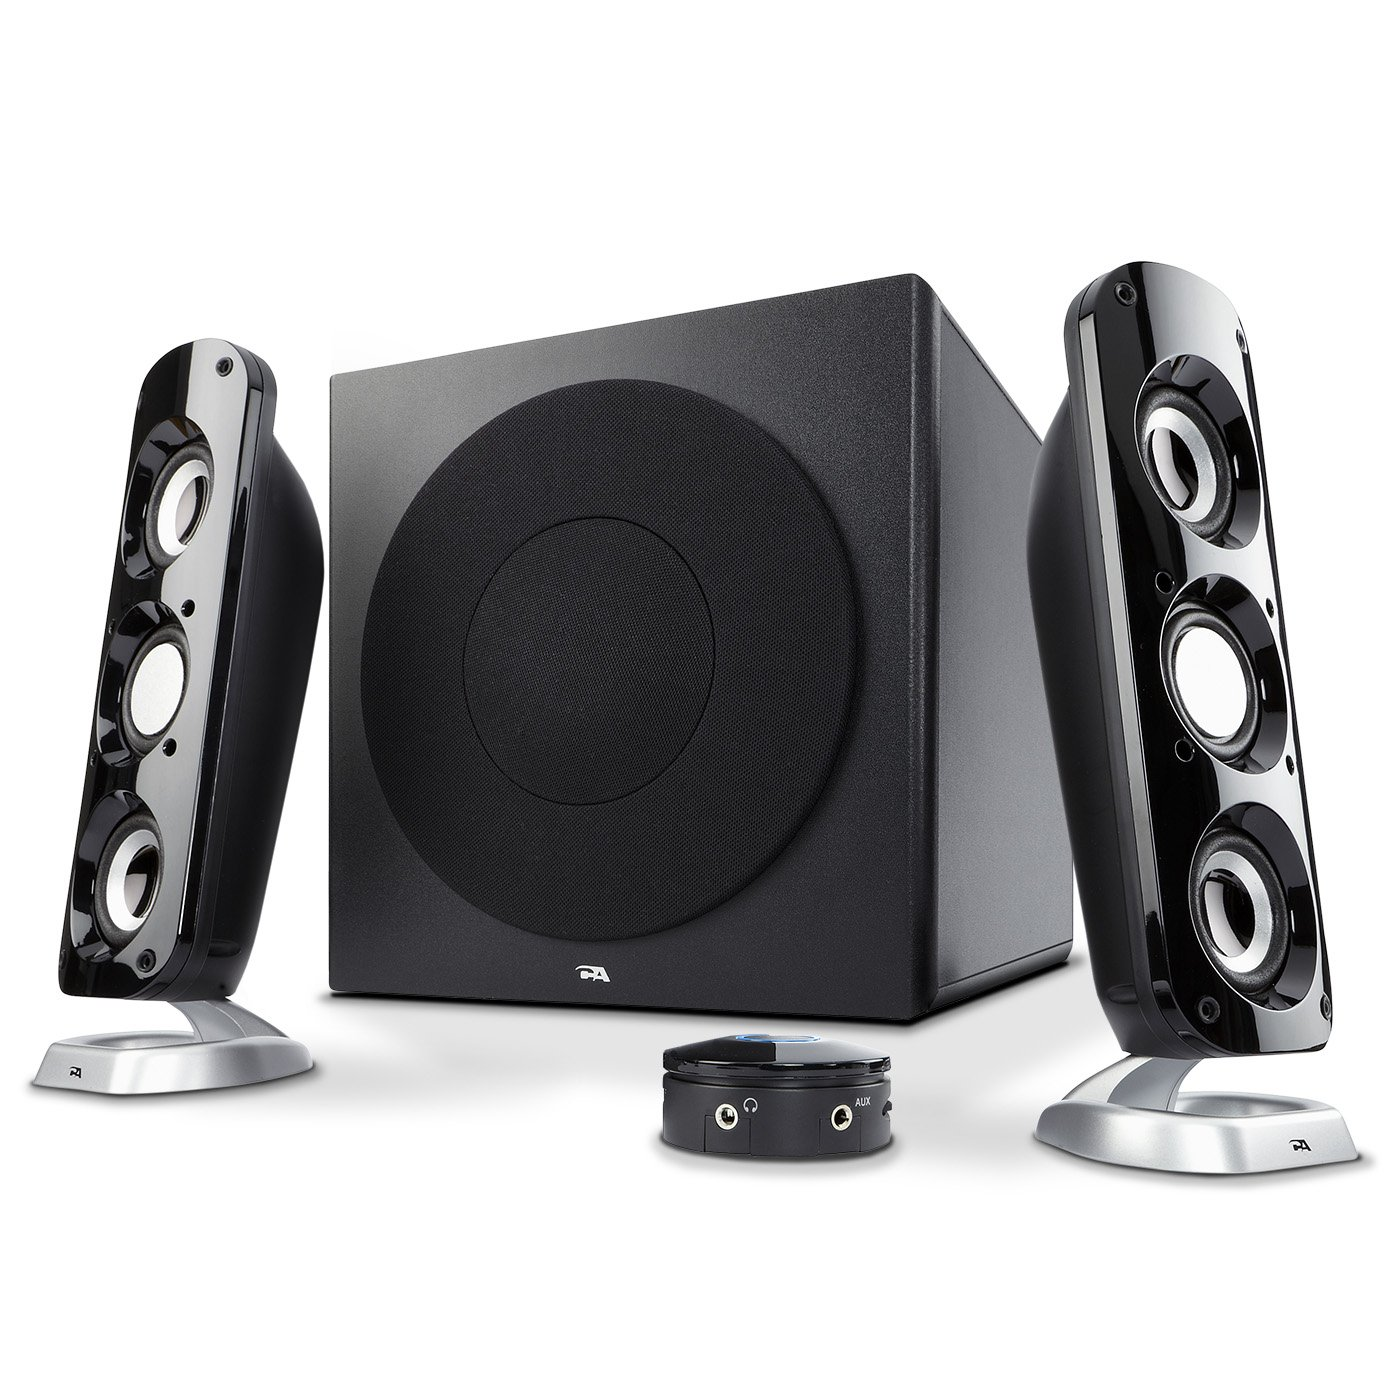 Cyber Acoustics CA-3908 46 Watt 2.1 Speaker System